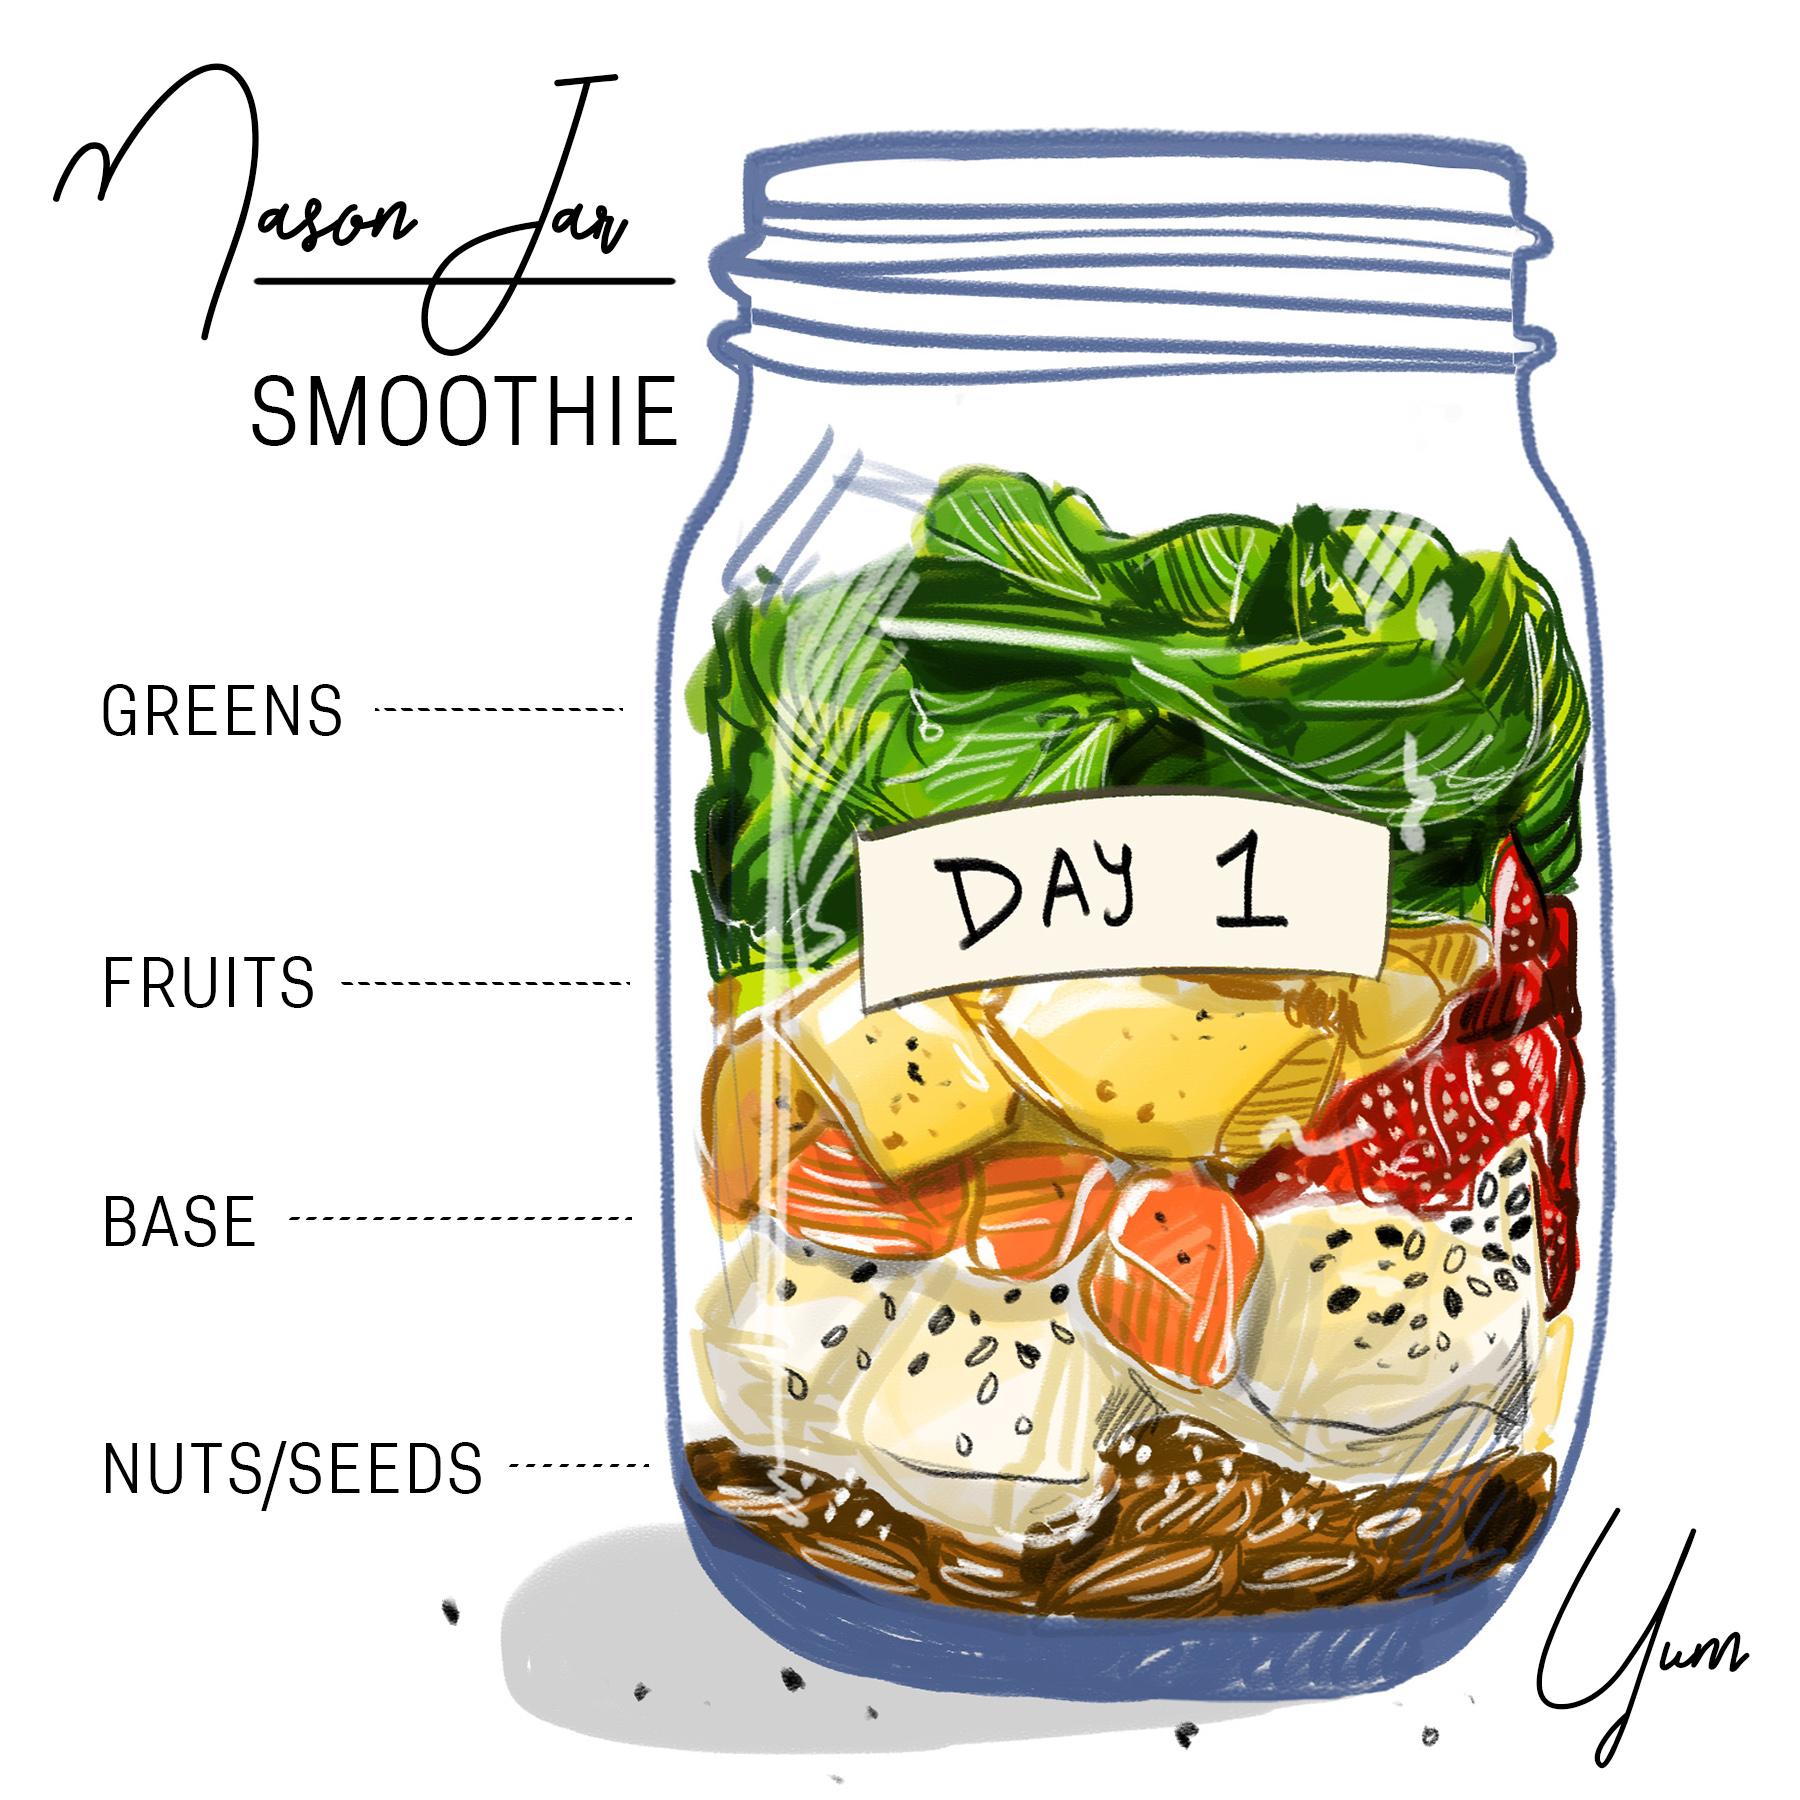 mason jar smoothie_amber day.jpg